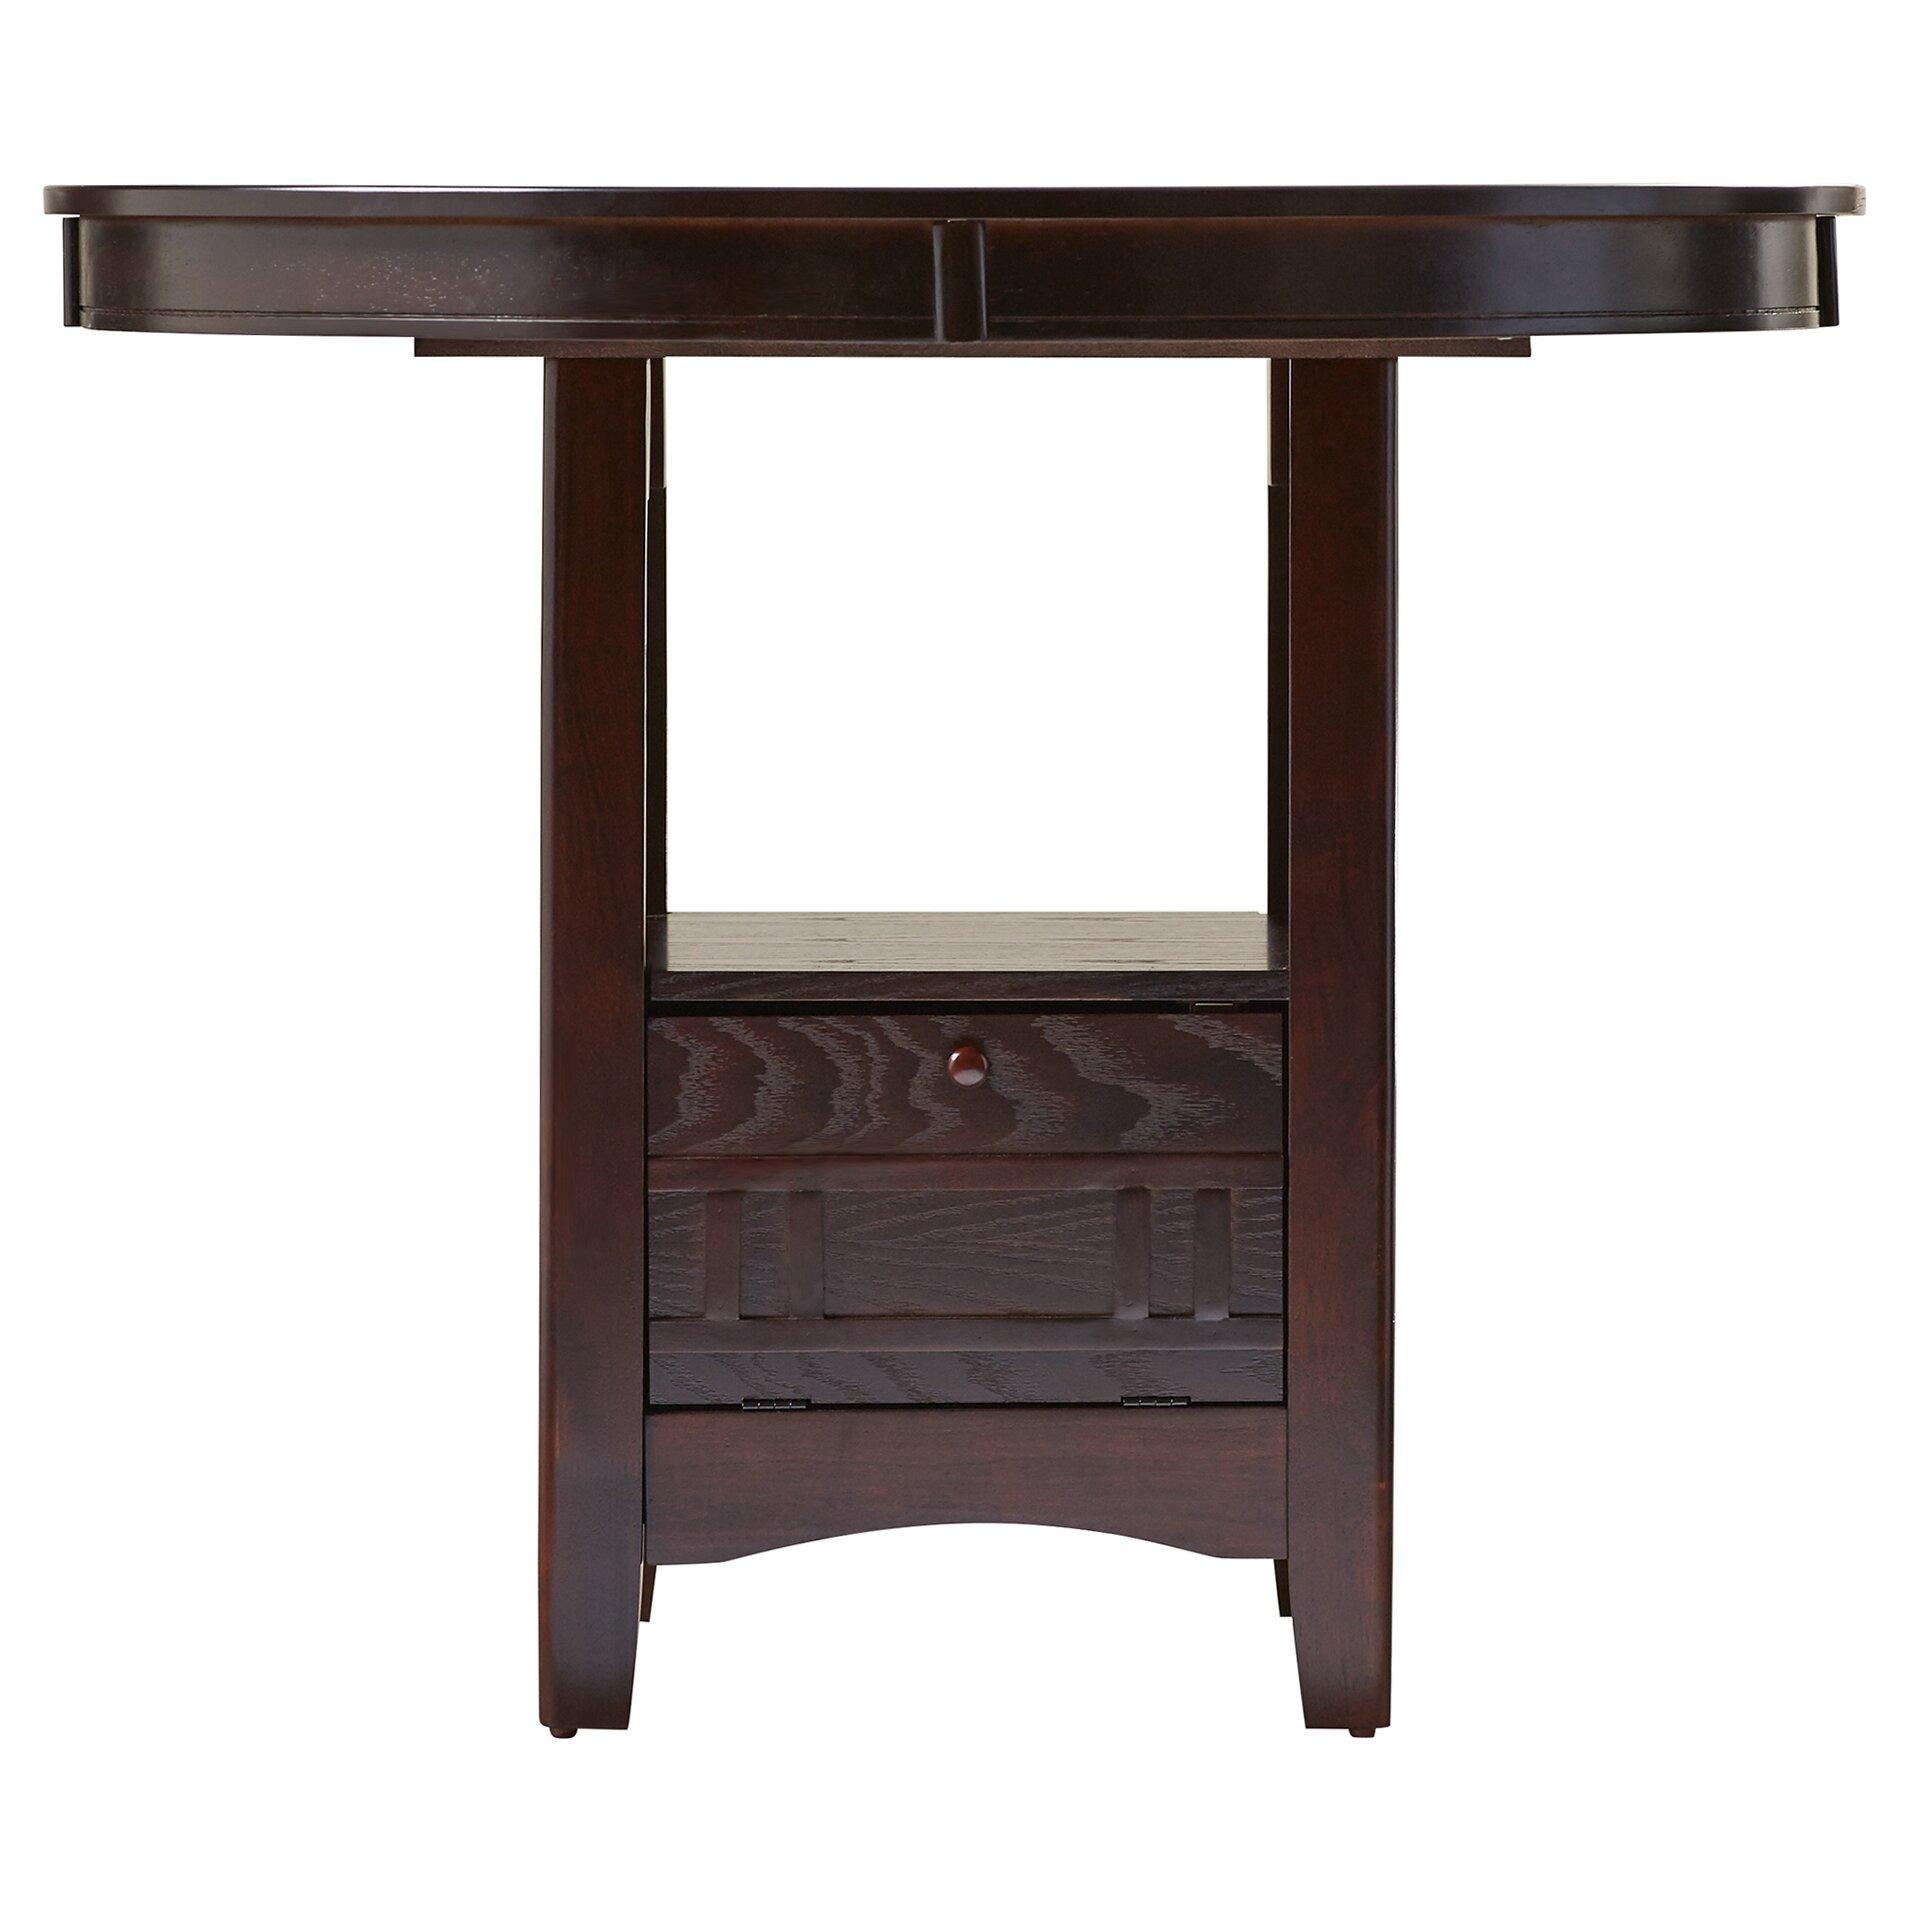 Alcott Hill Norwalk Counter Height Extendable Dining Table  : Alcott Hill25C225AE Norwalk Counter Height Extendable Dining Table from www.wayfair.com size 1920 x 1920 jpeg 252kB